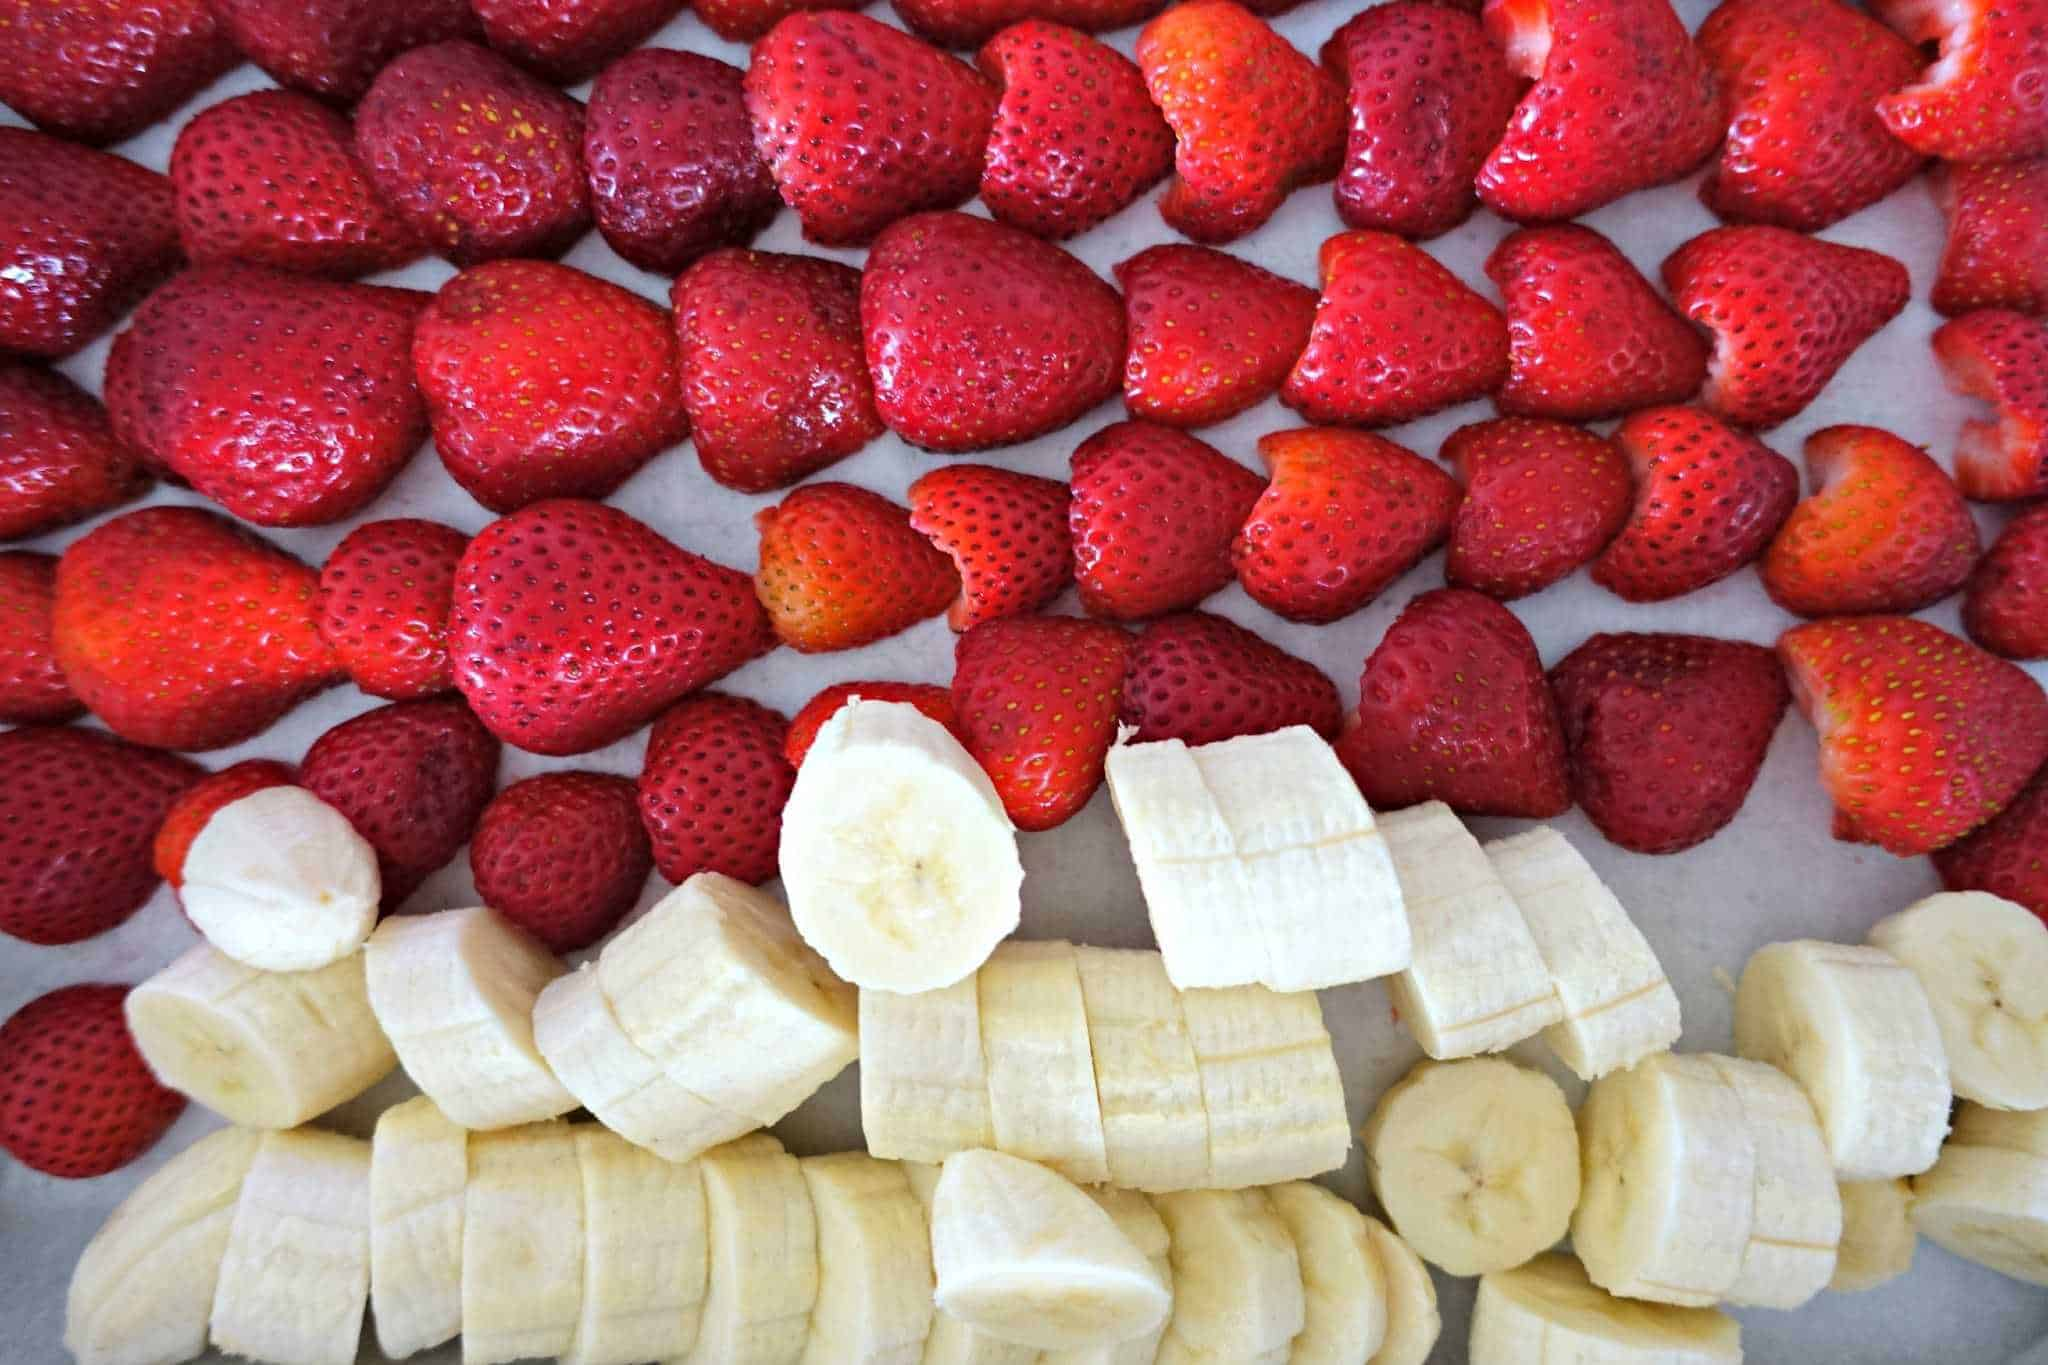 Sliced Strawberries and Bananas